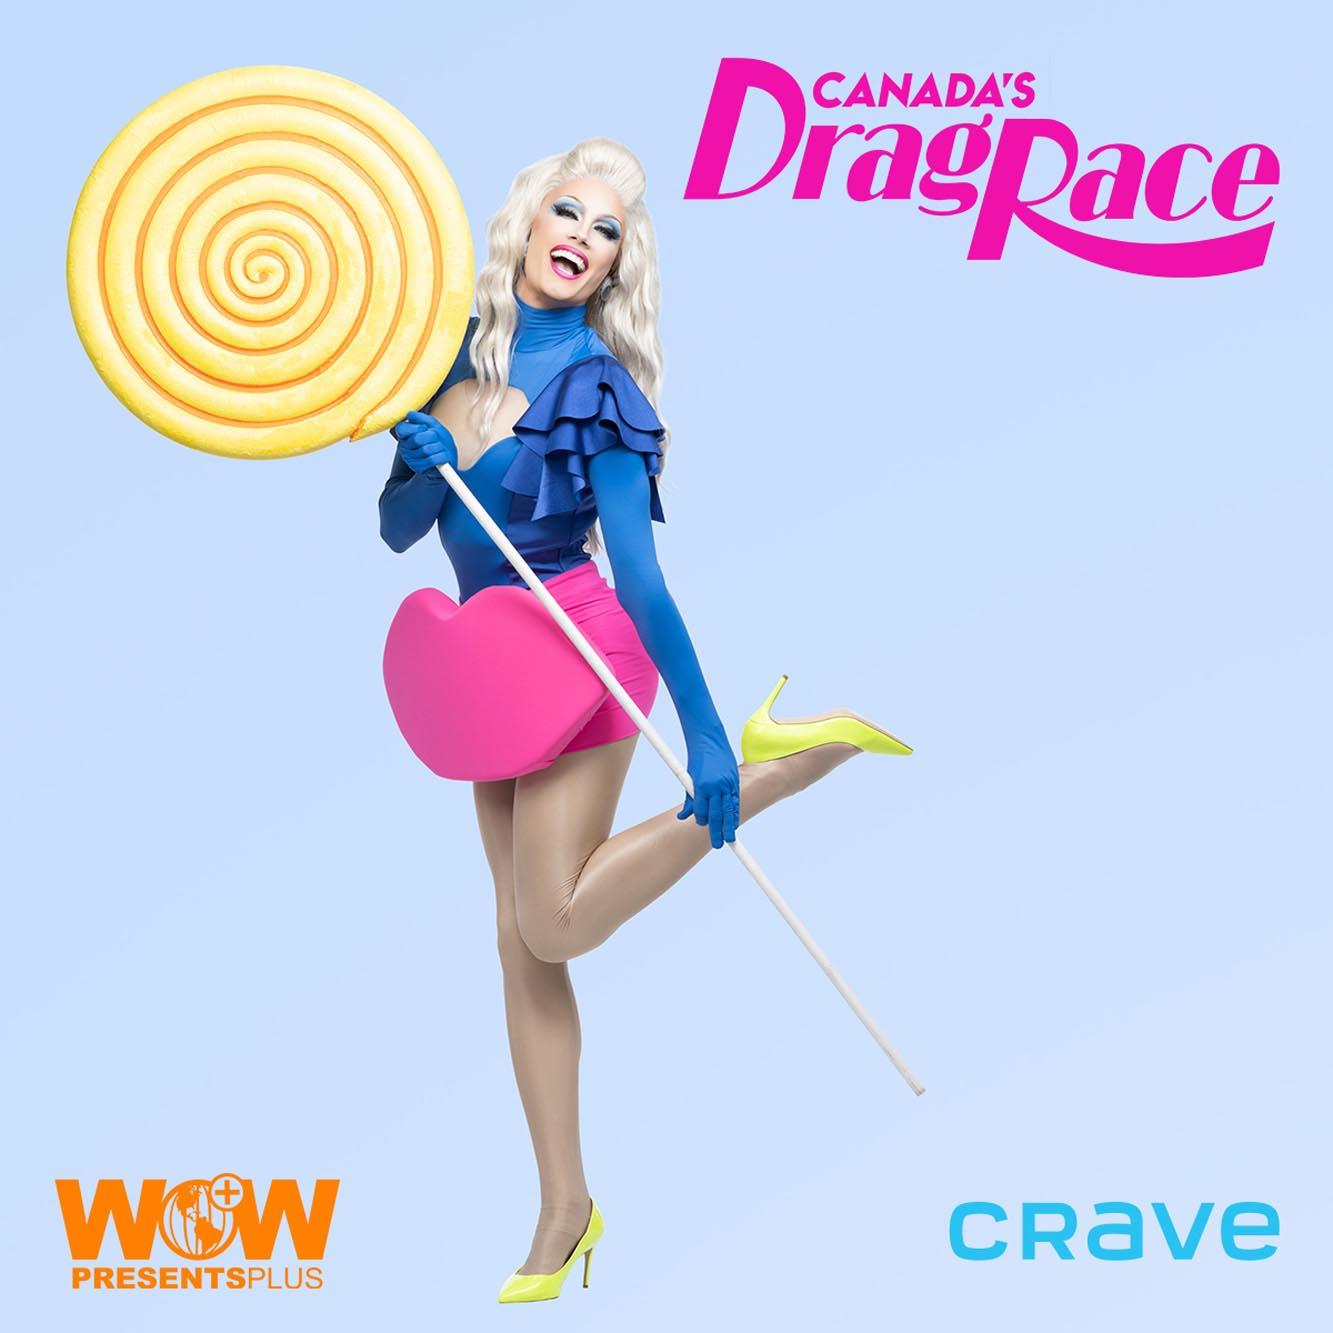 Canada's Drag Race Season 2